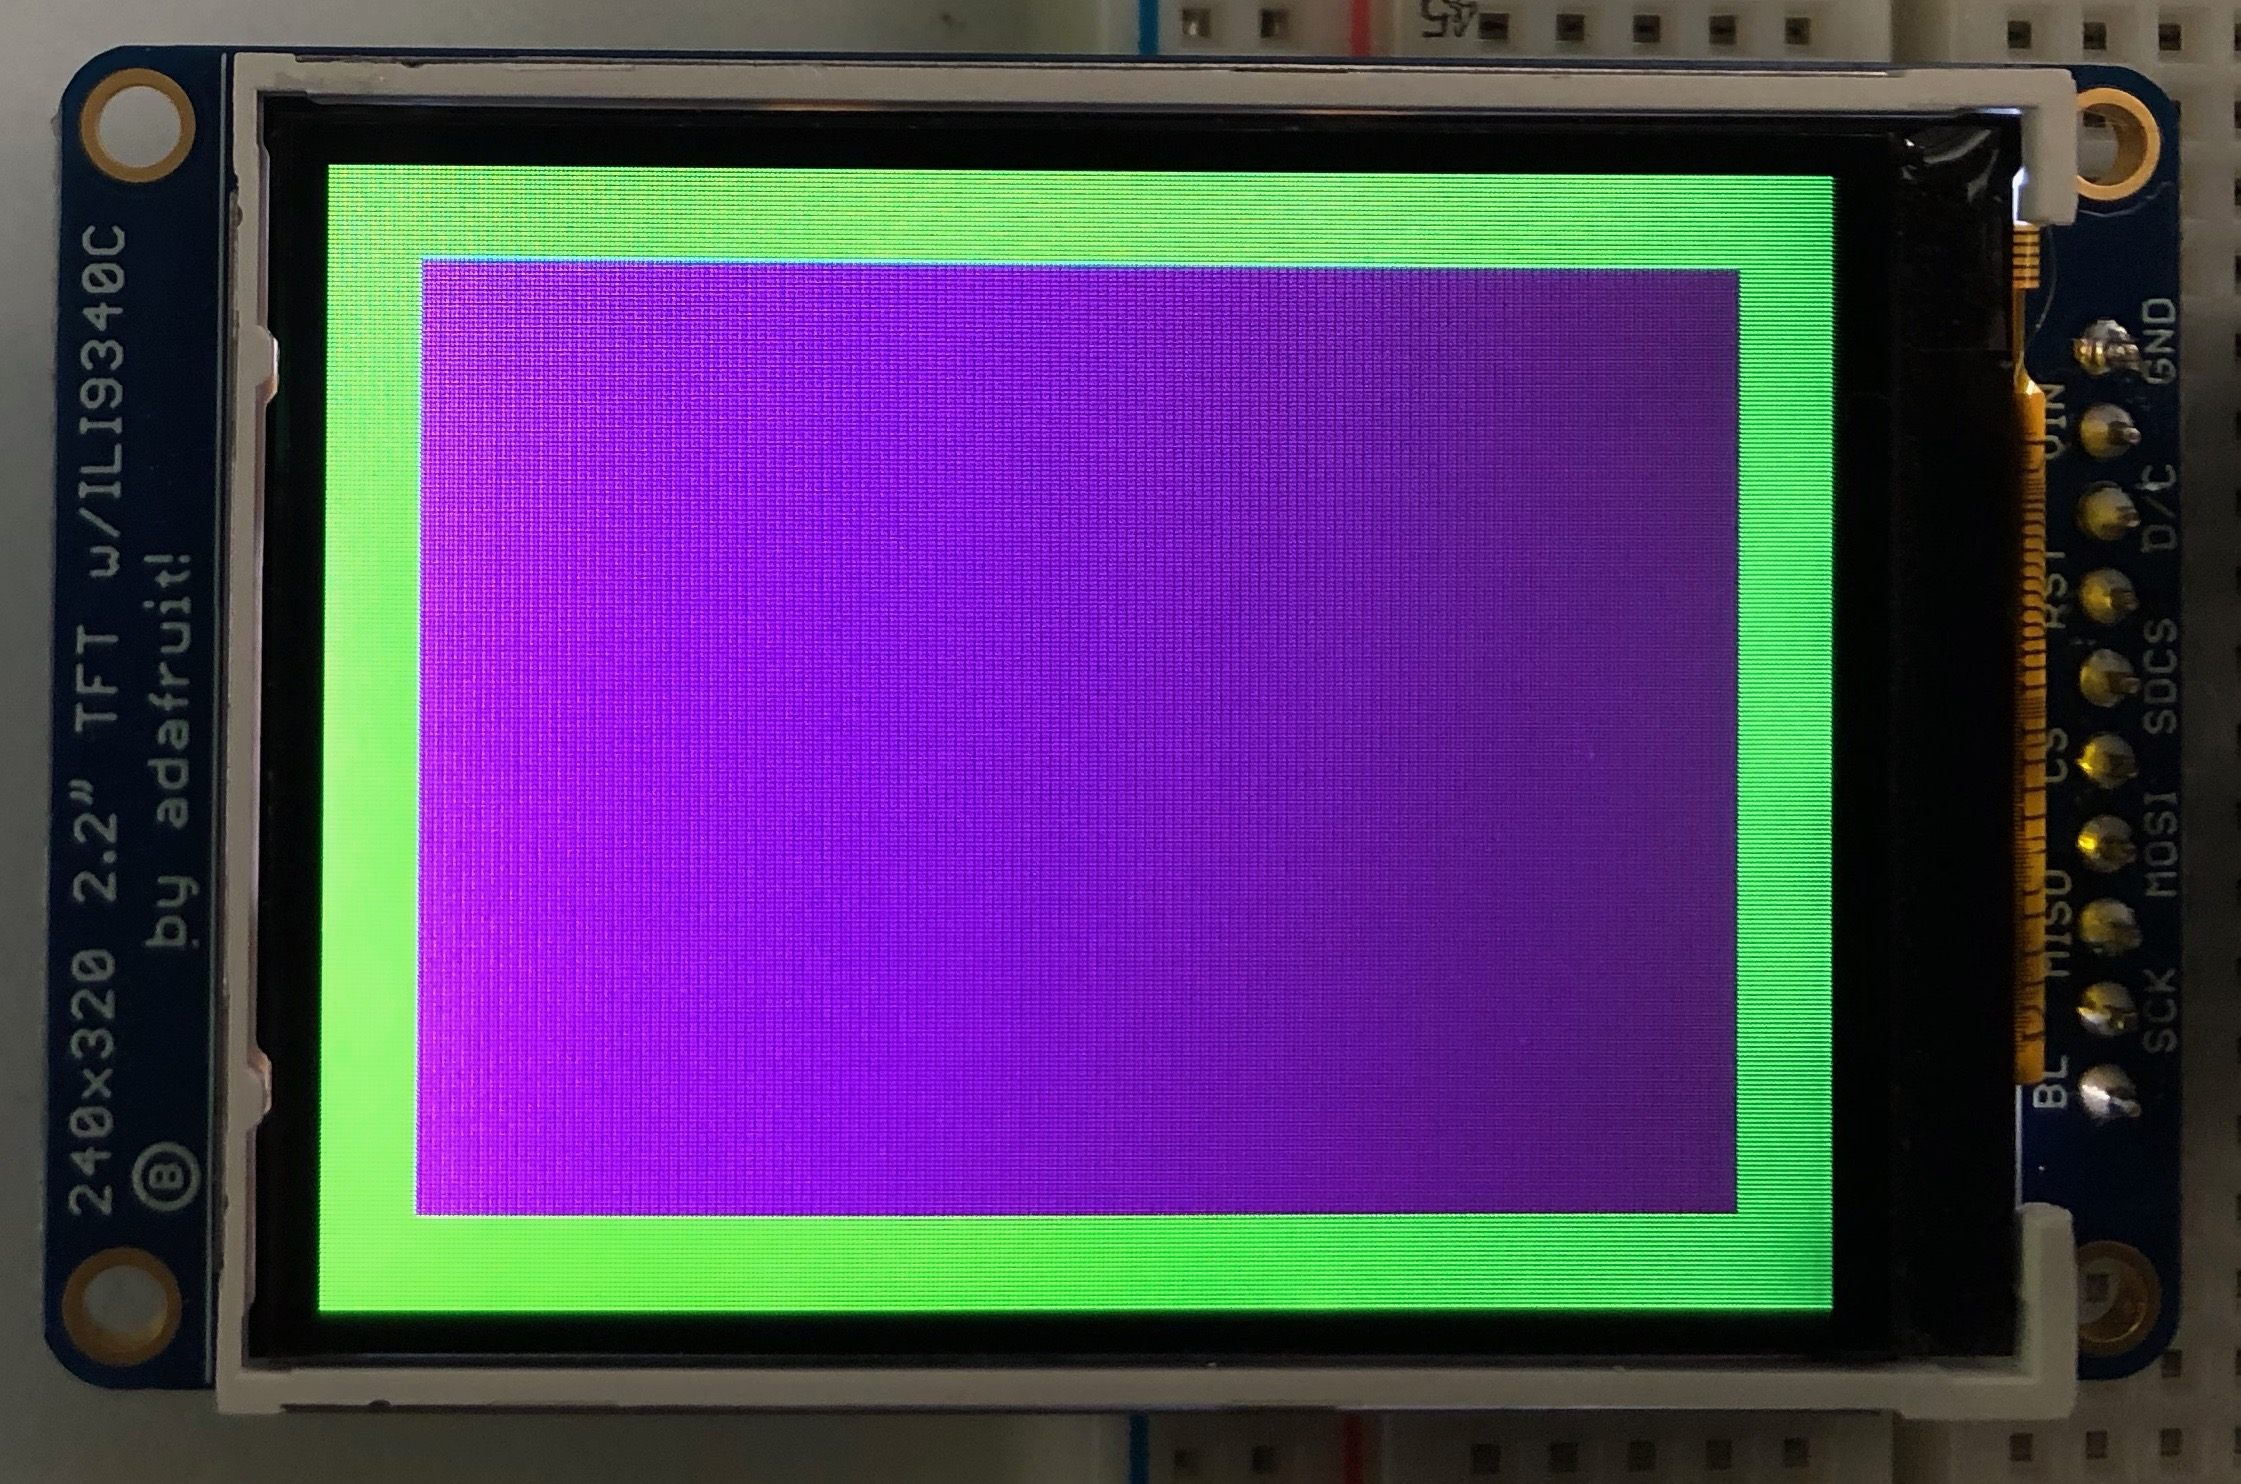 arduino_compatibles_2.2-green-purple.jpeg